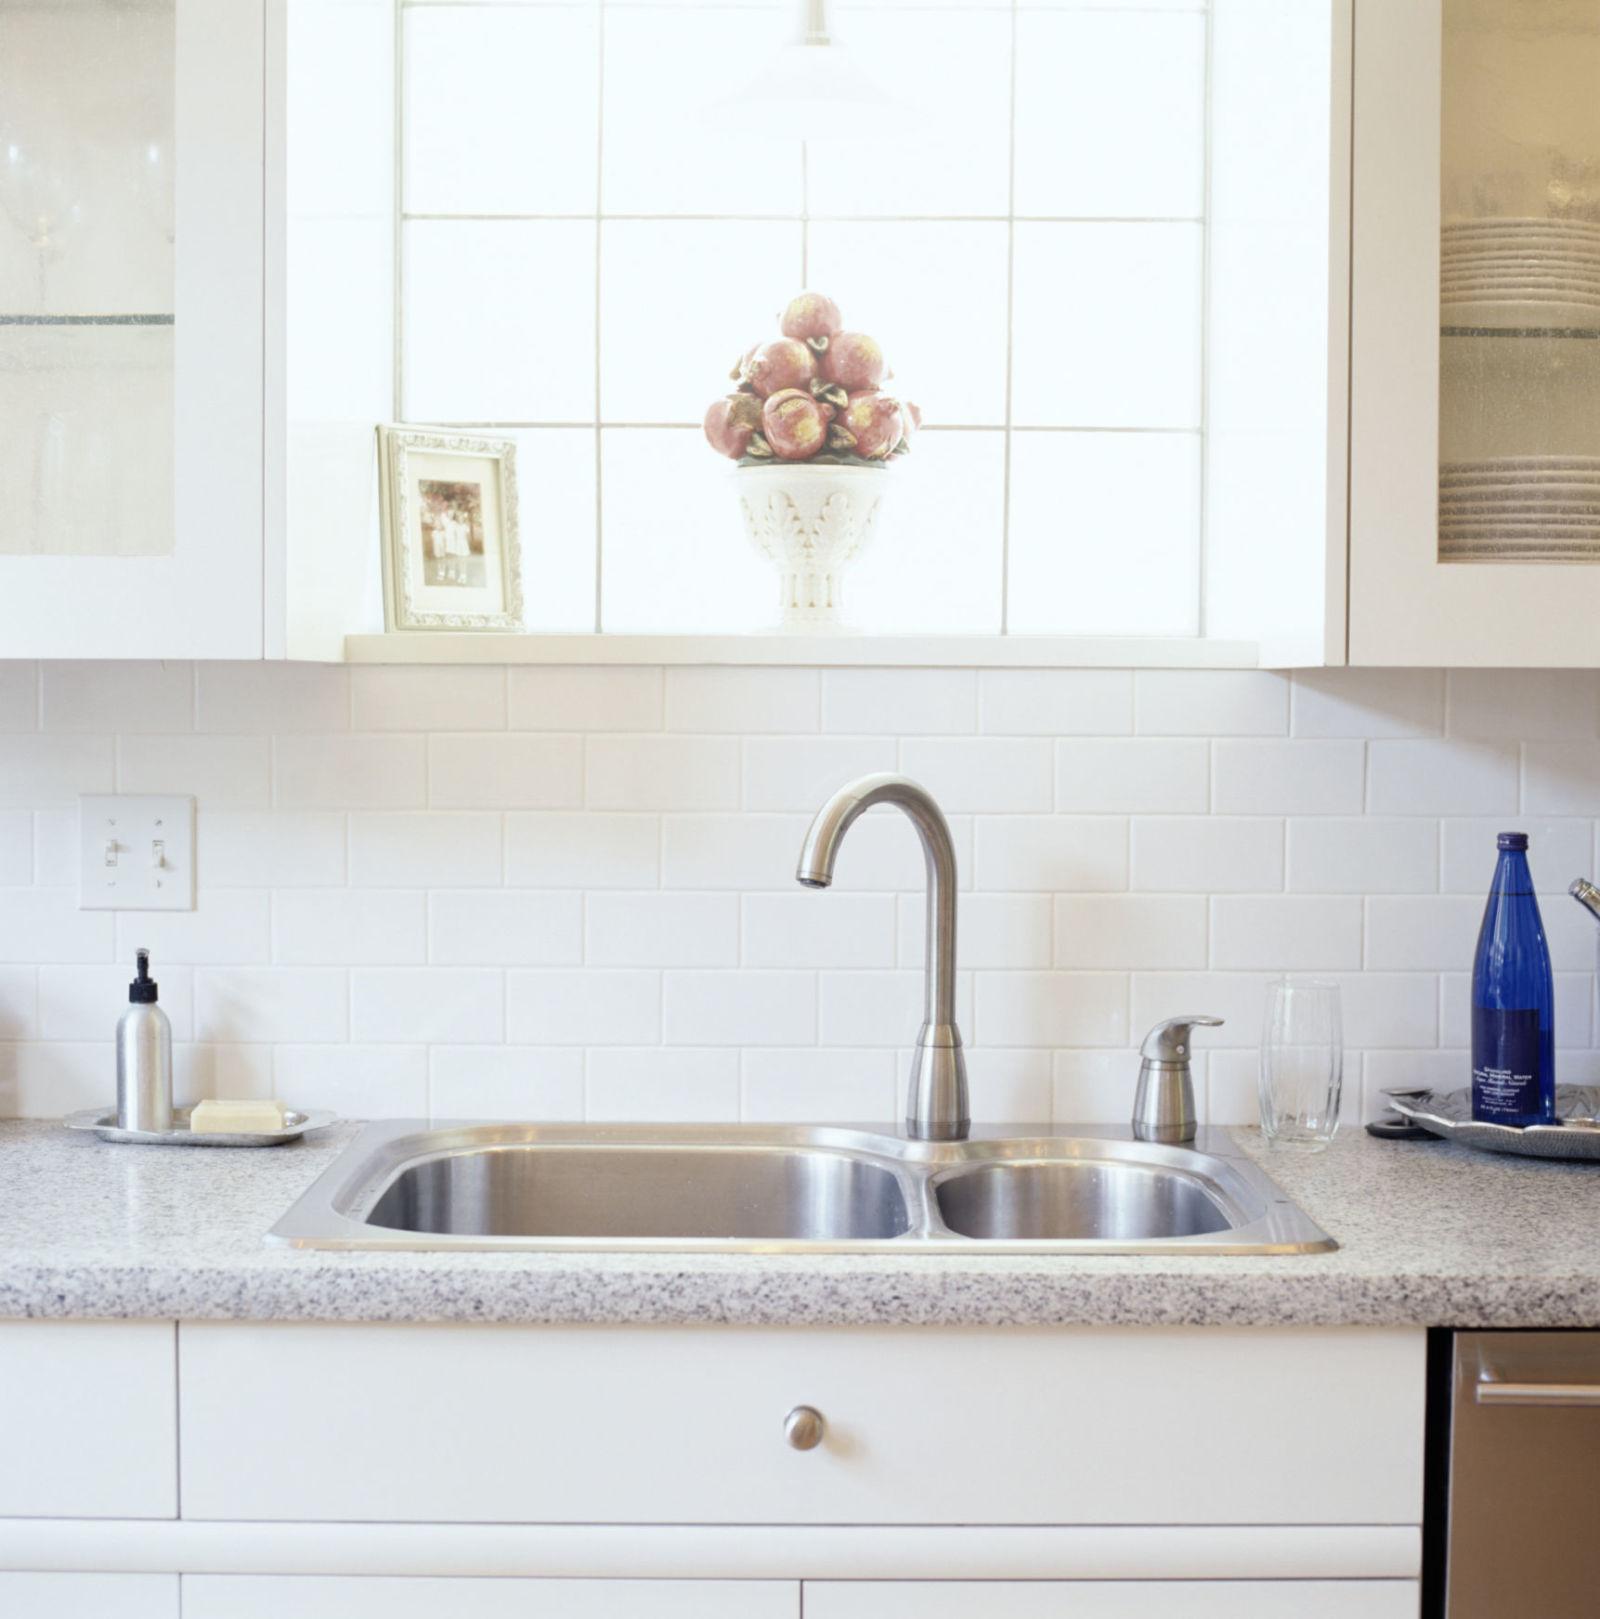 Ways to Keep Kitchen Sink Clean and Sparkling - DIYVila